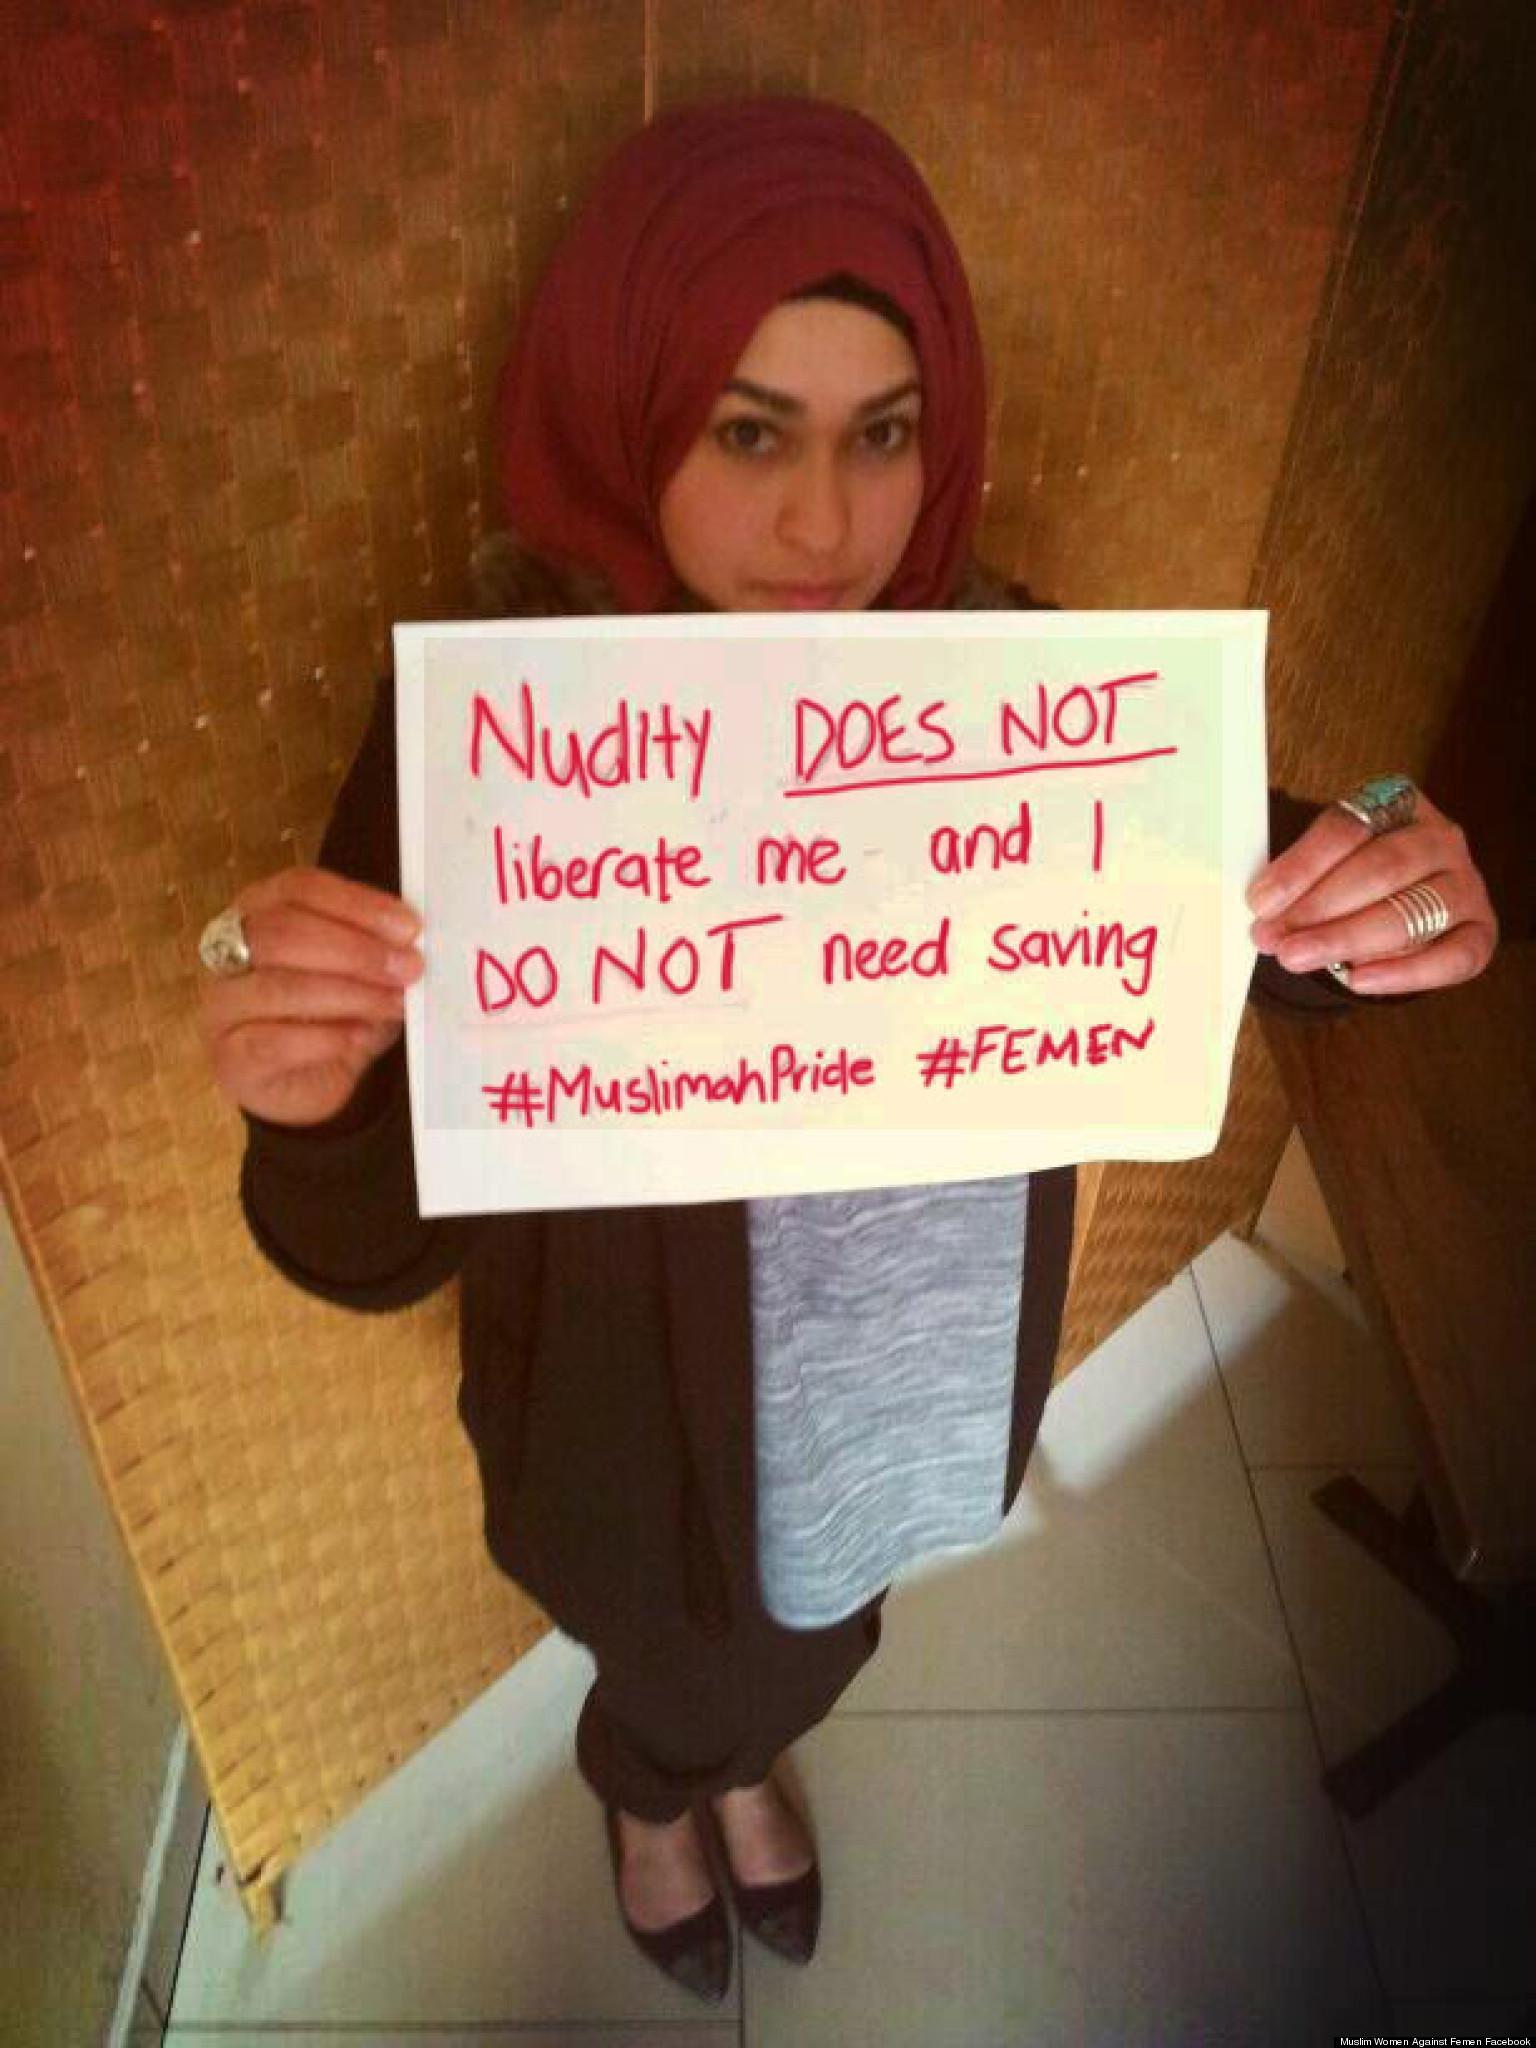 Free hd nude photo of muslim women s